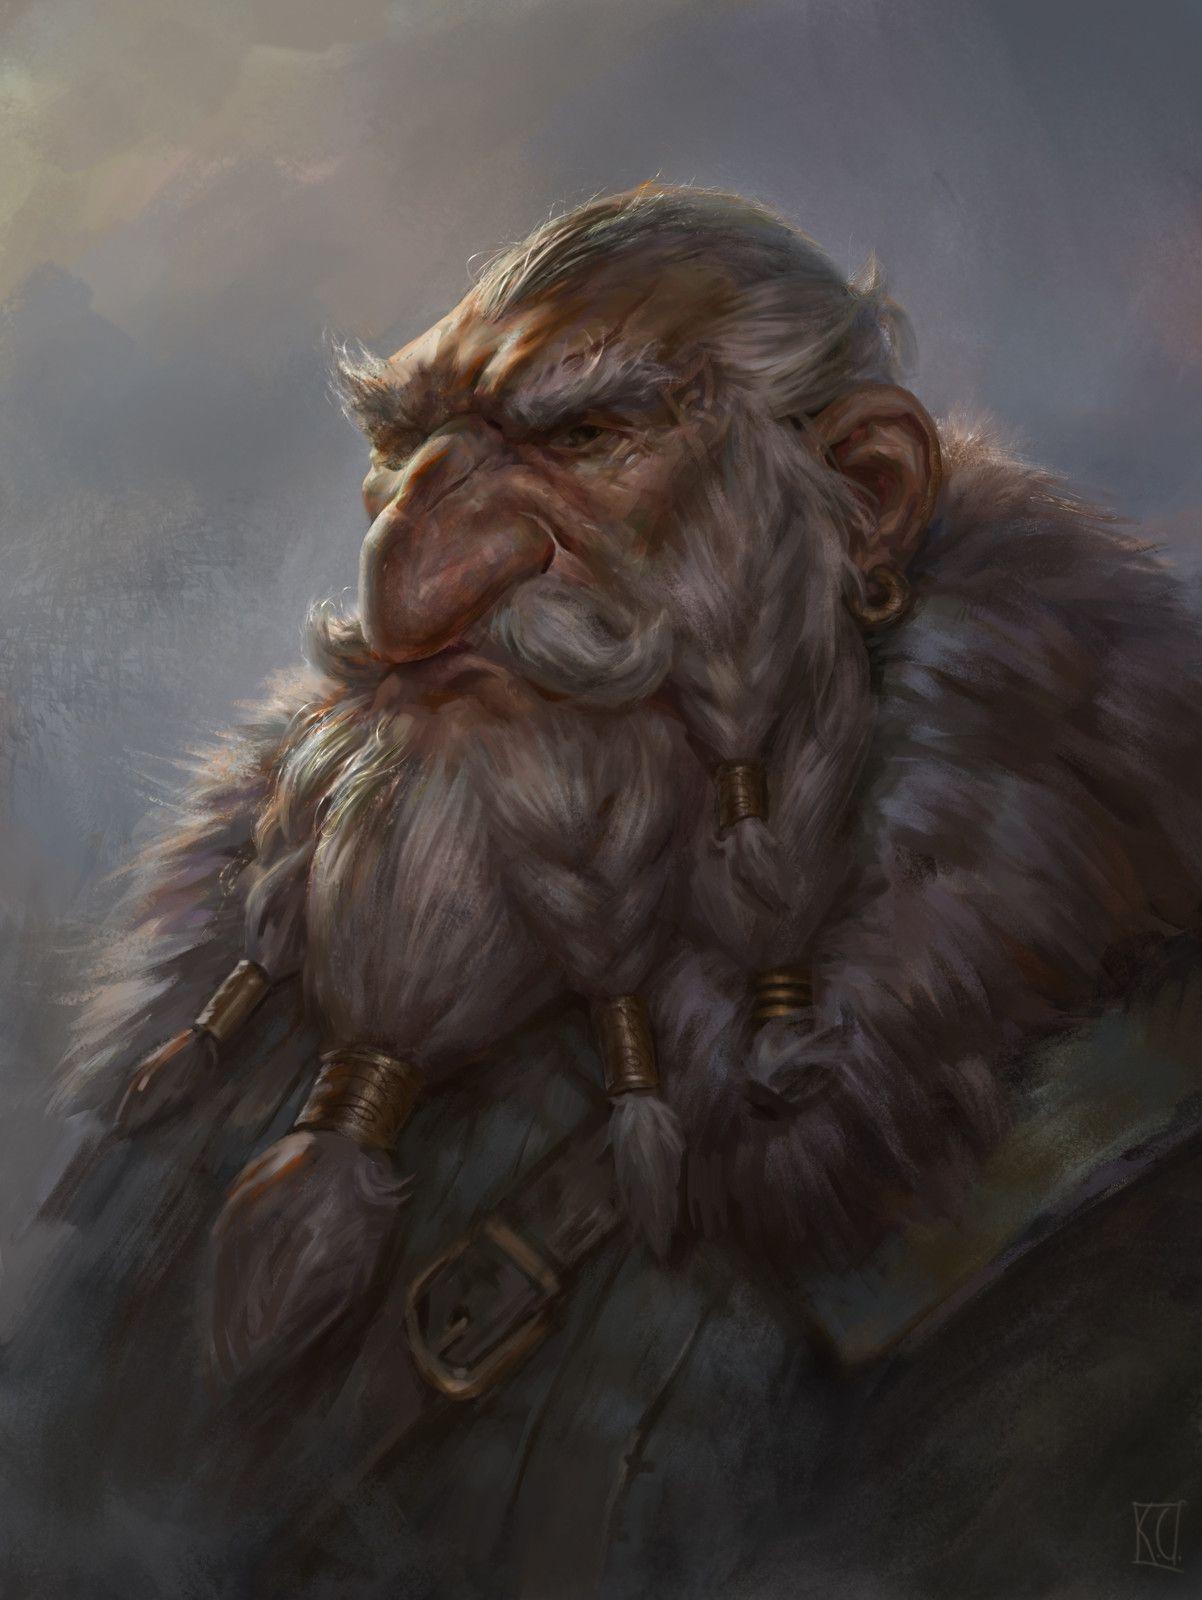 211 Best Portraits: Dwarves images in 2019 | Fantasy dwarf ... |Dwarf Male Portrait